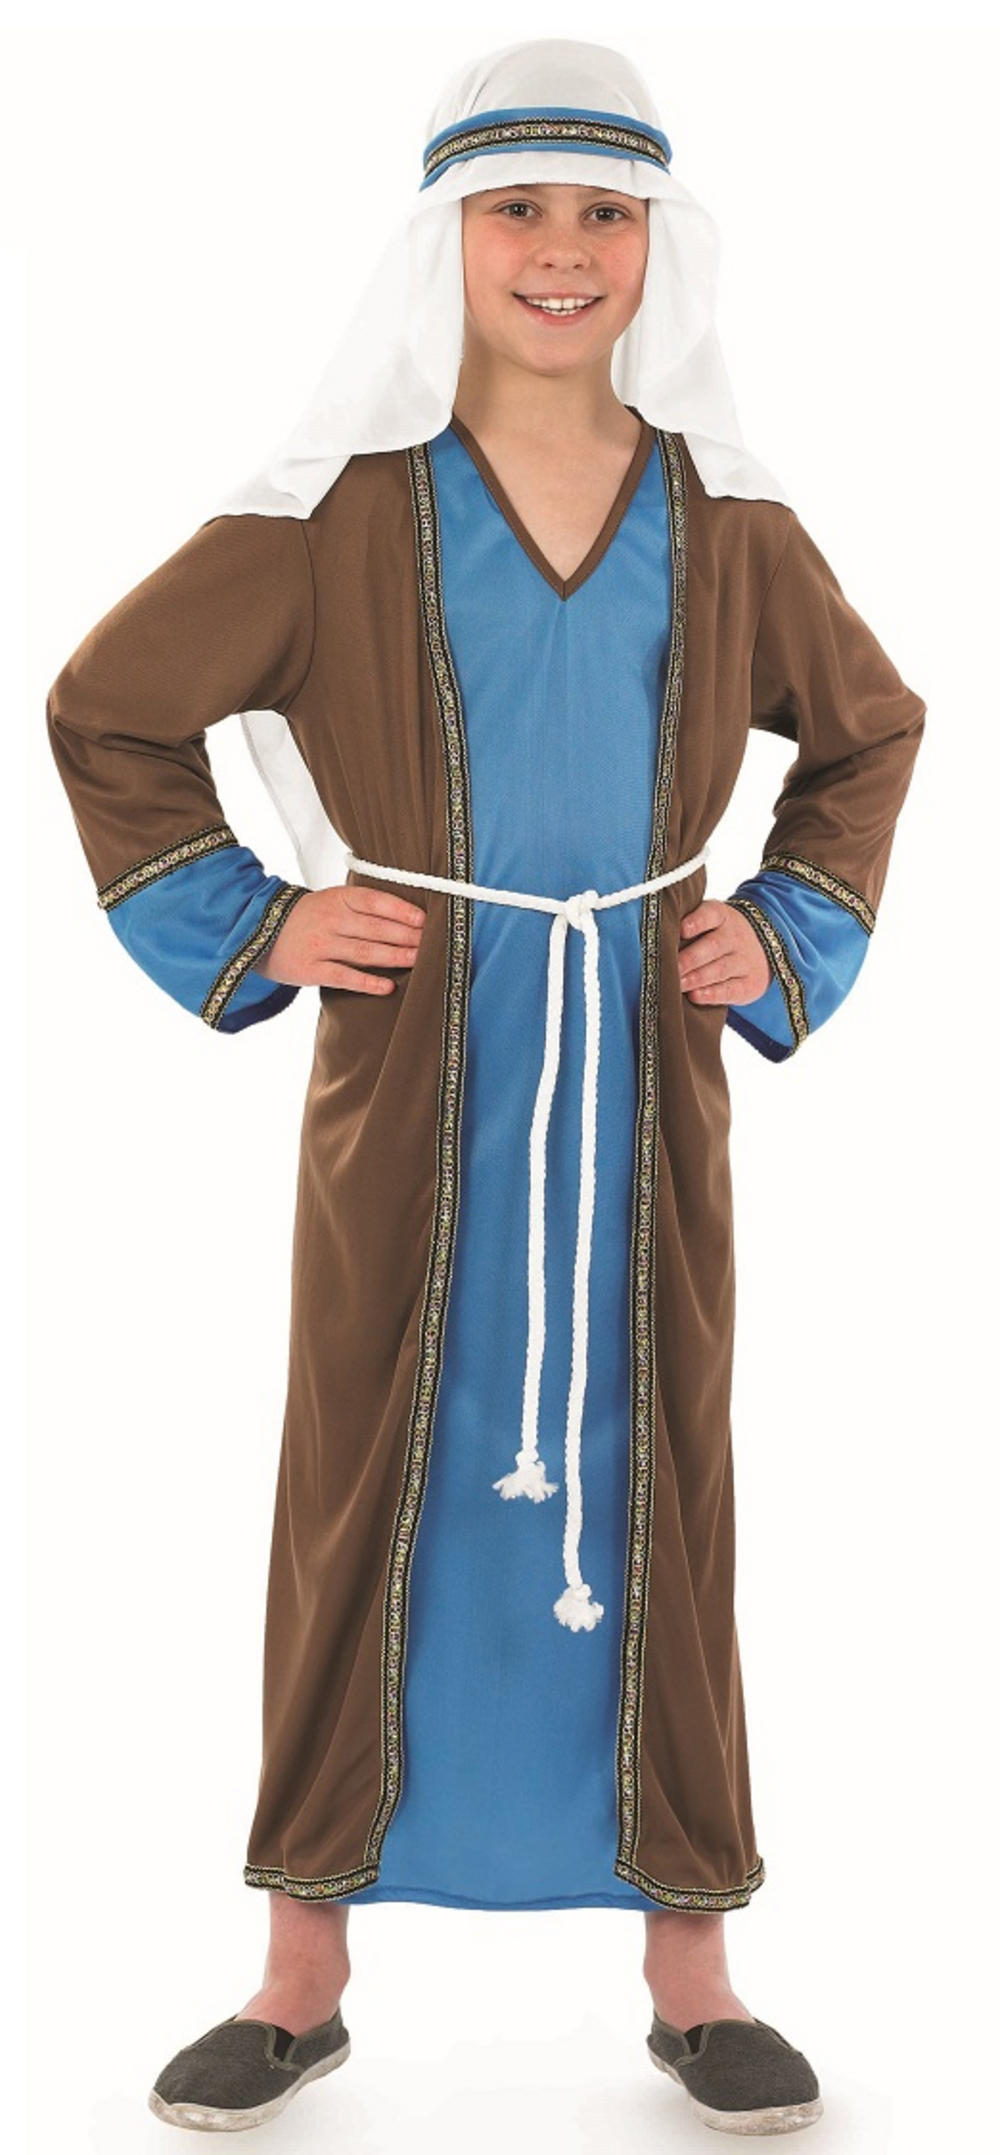 Joseph Costume   Christmas Clearance   Mega Fancy Dress